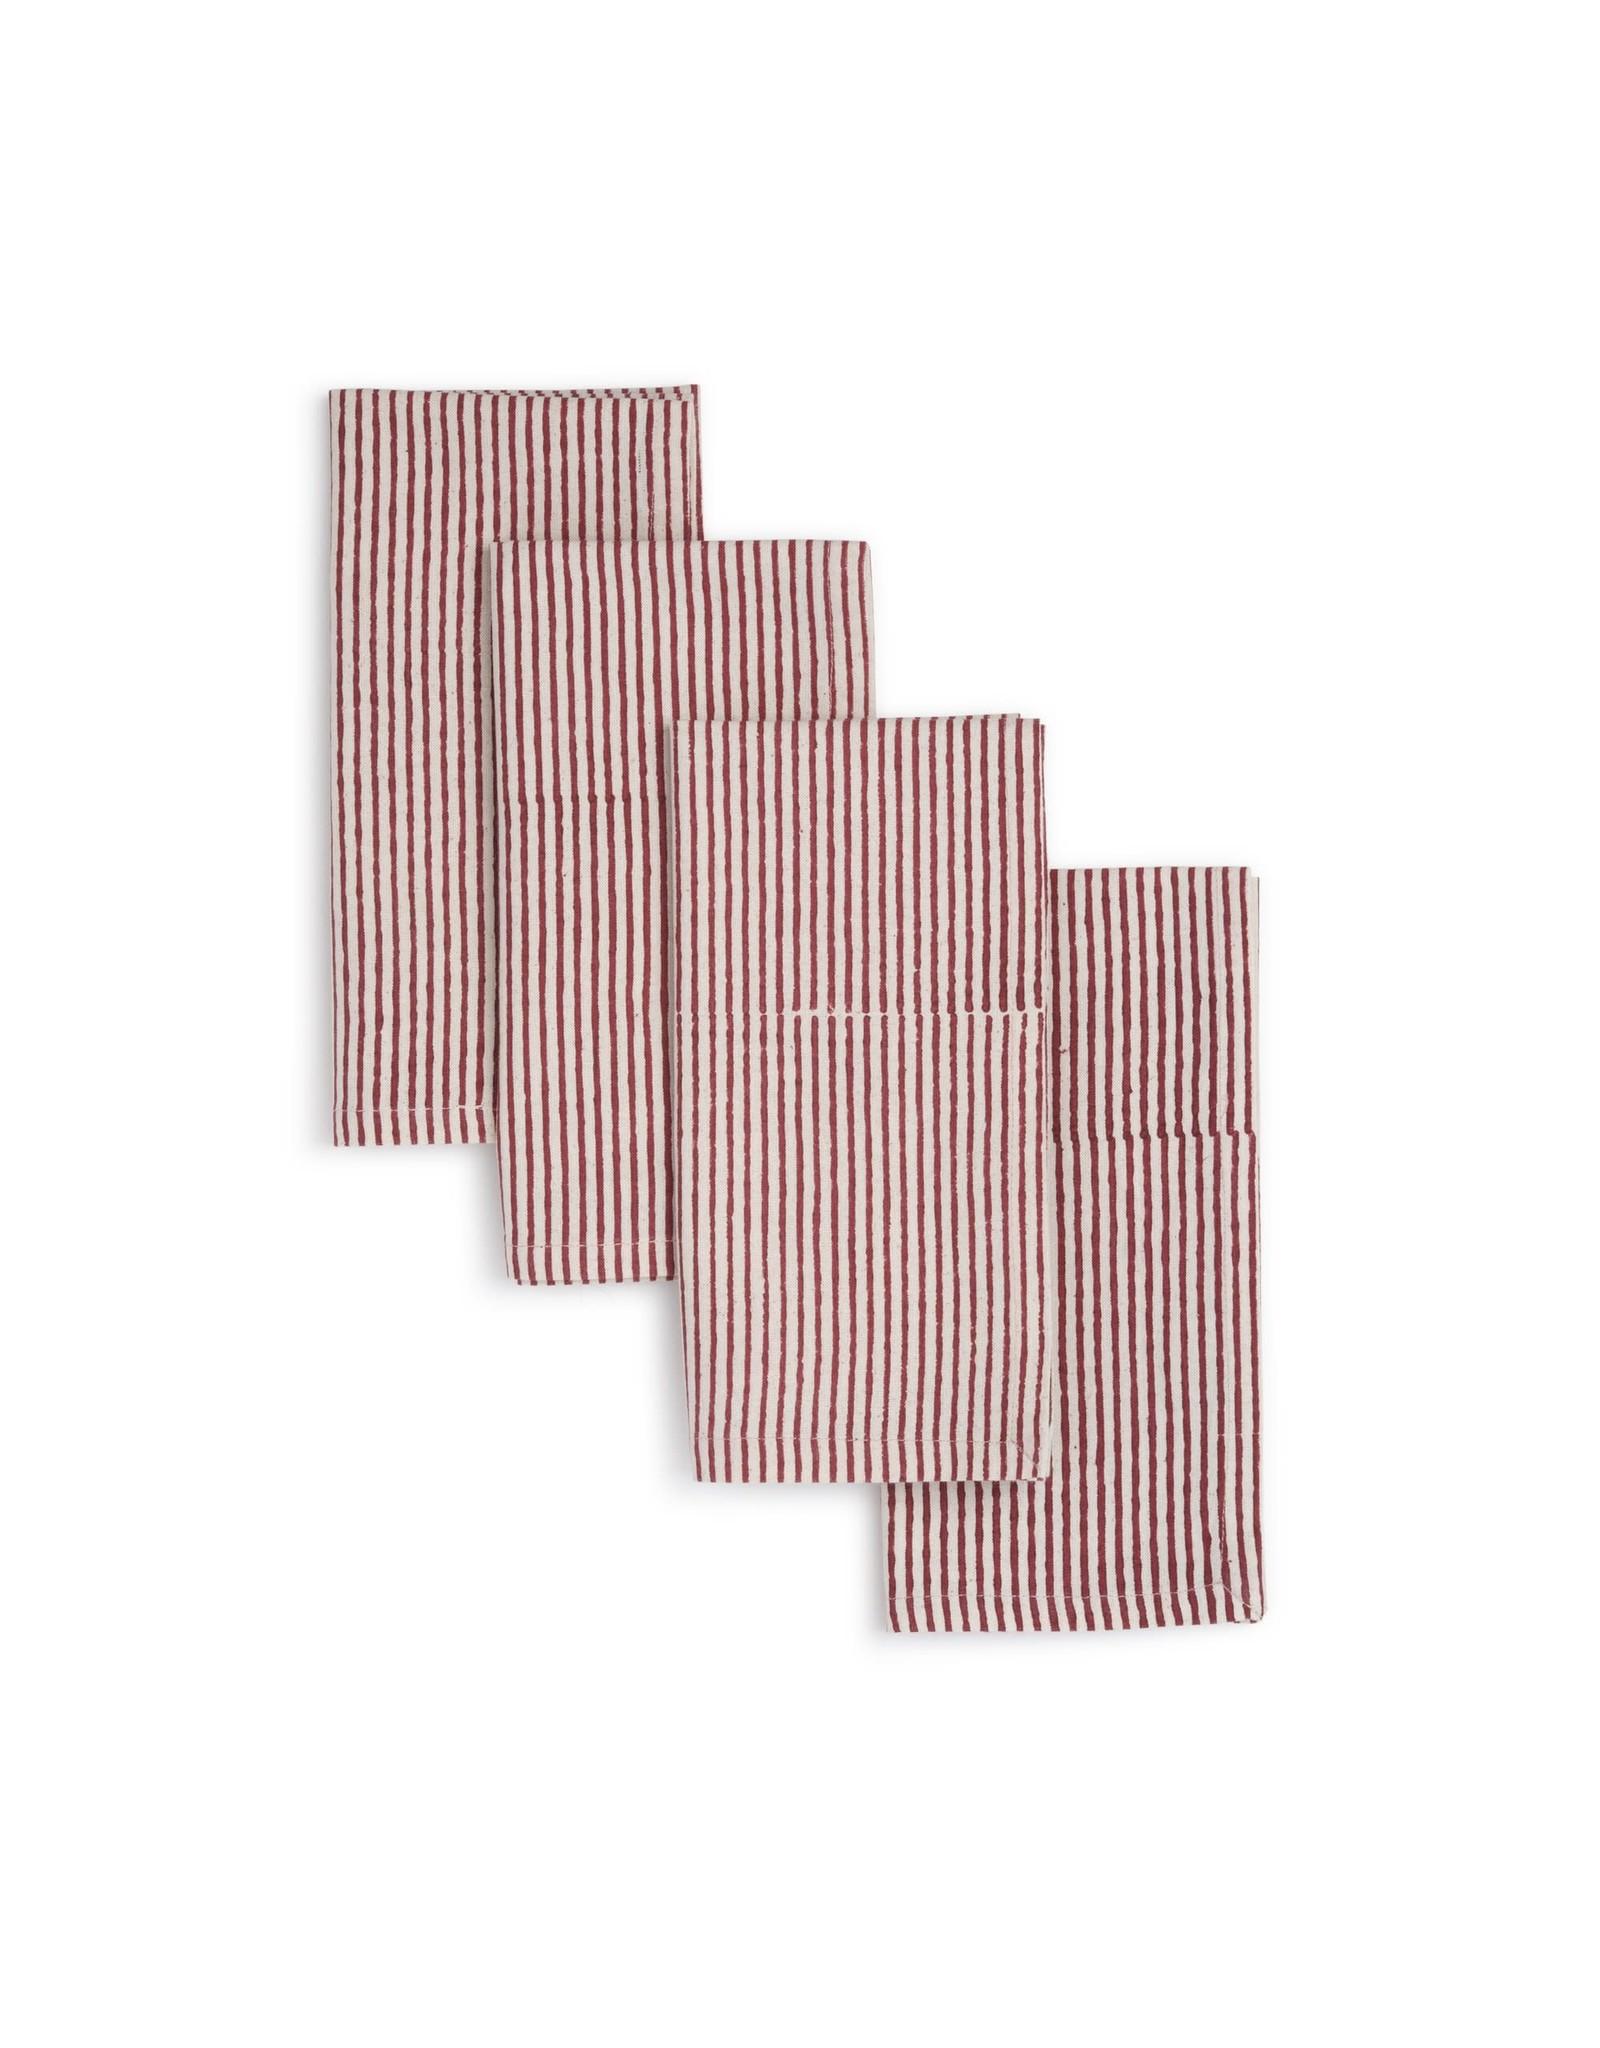 18 x 18 Cotton Napkins,  Set of 4,  Hibiscus, India